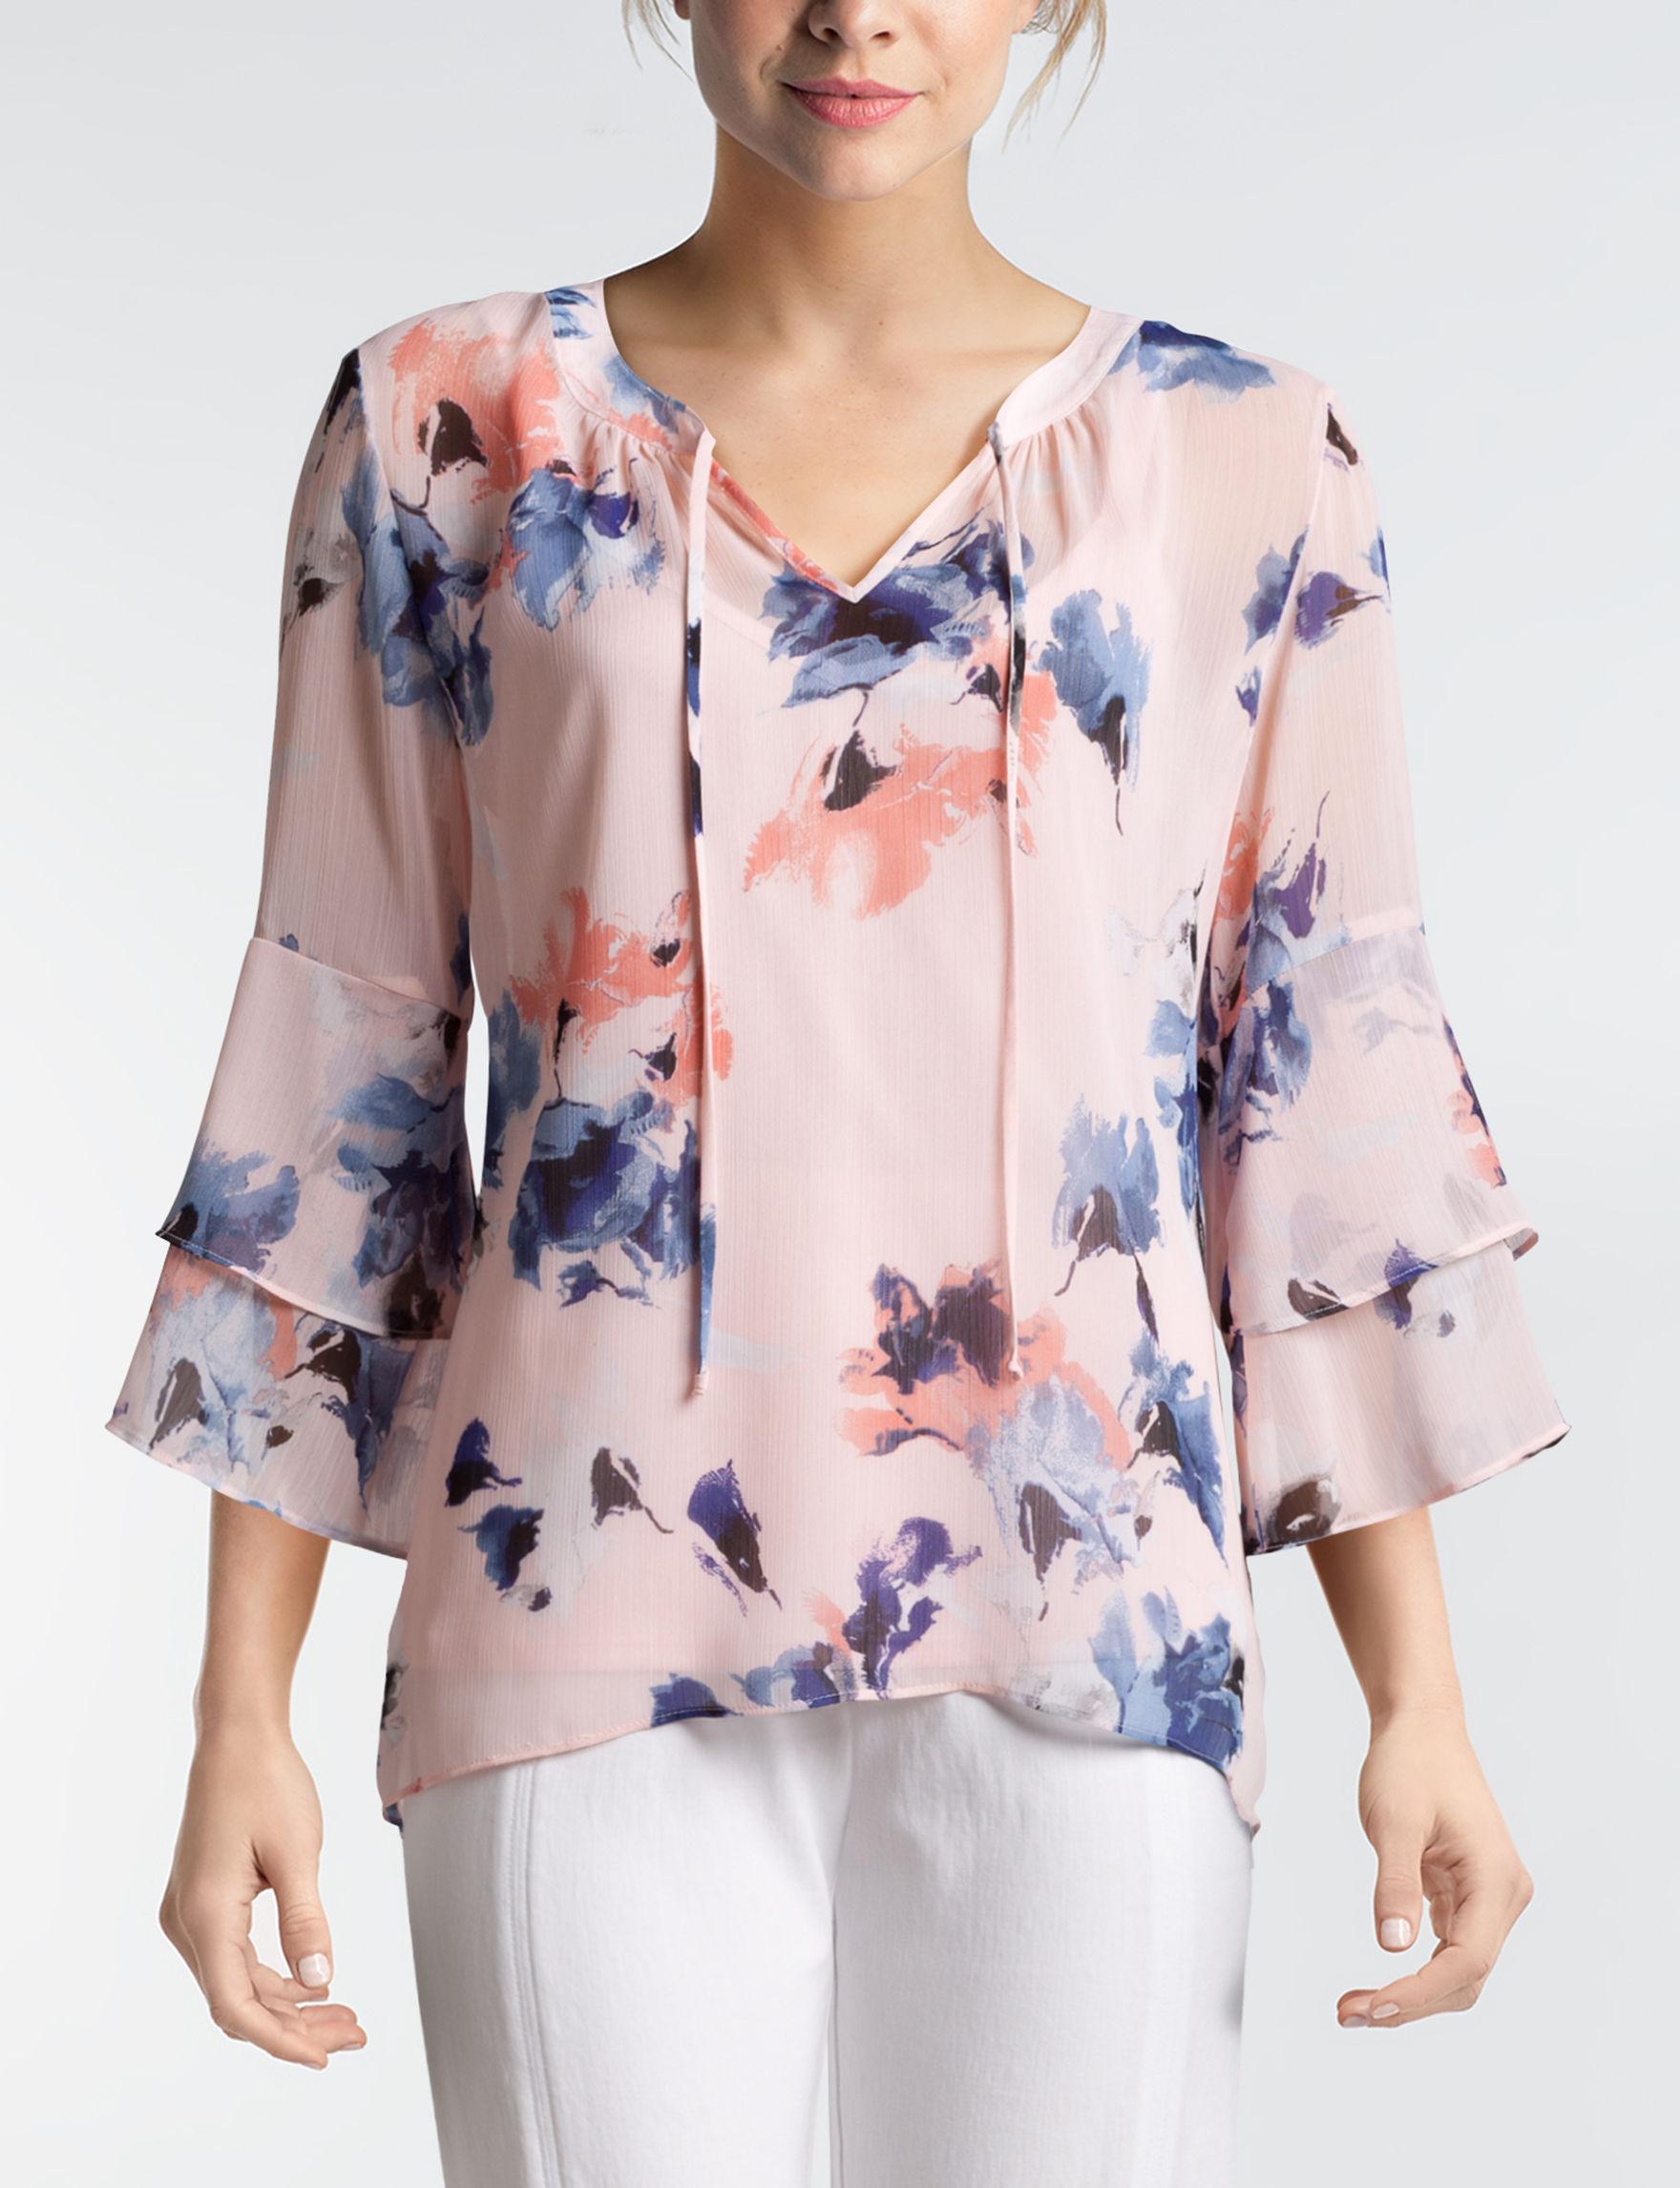 A. Byer Pink Floral